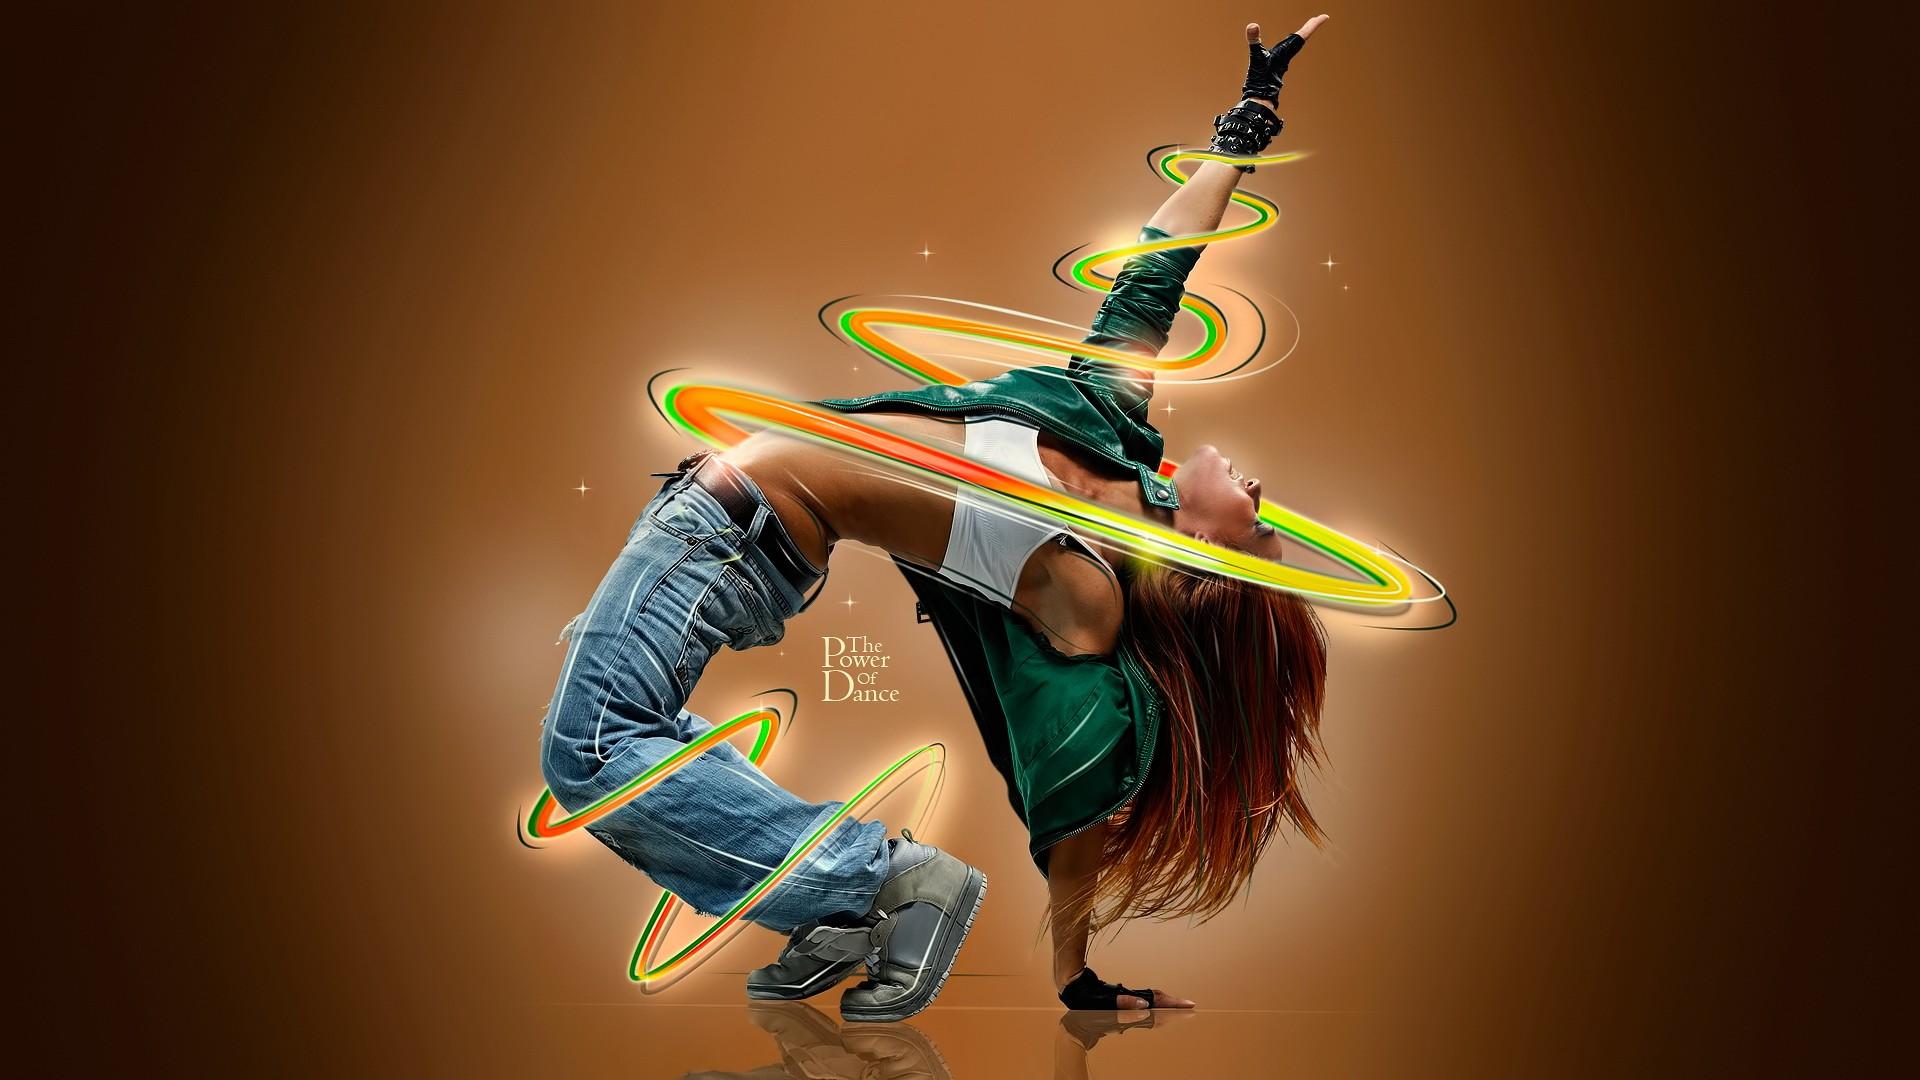 танец креативное dance creative  № 3510307 бесплатно